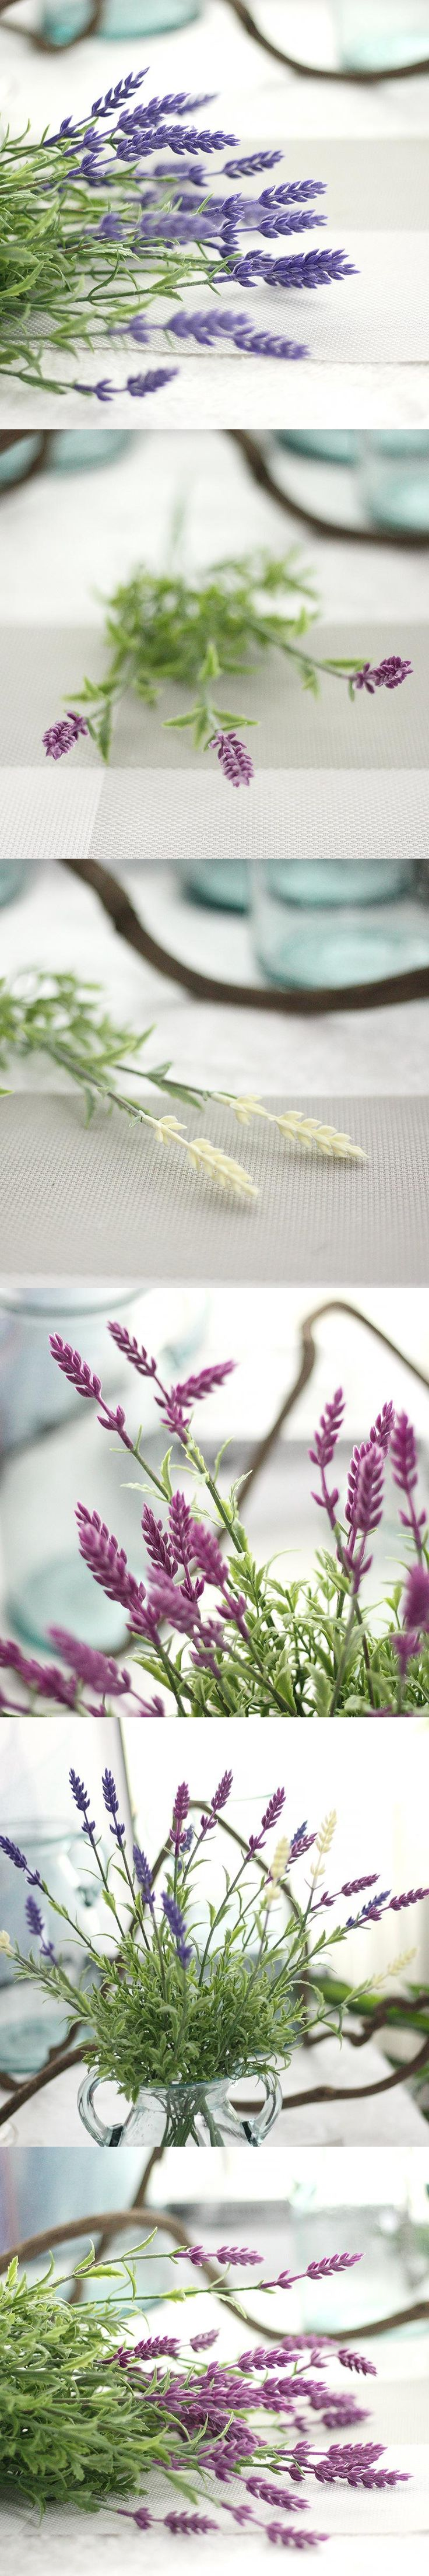 Fake Plants Artificial Lavender Leaves Grass nice room Floral Mini Green Decor Flowers Arrangement